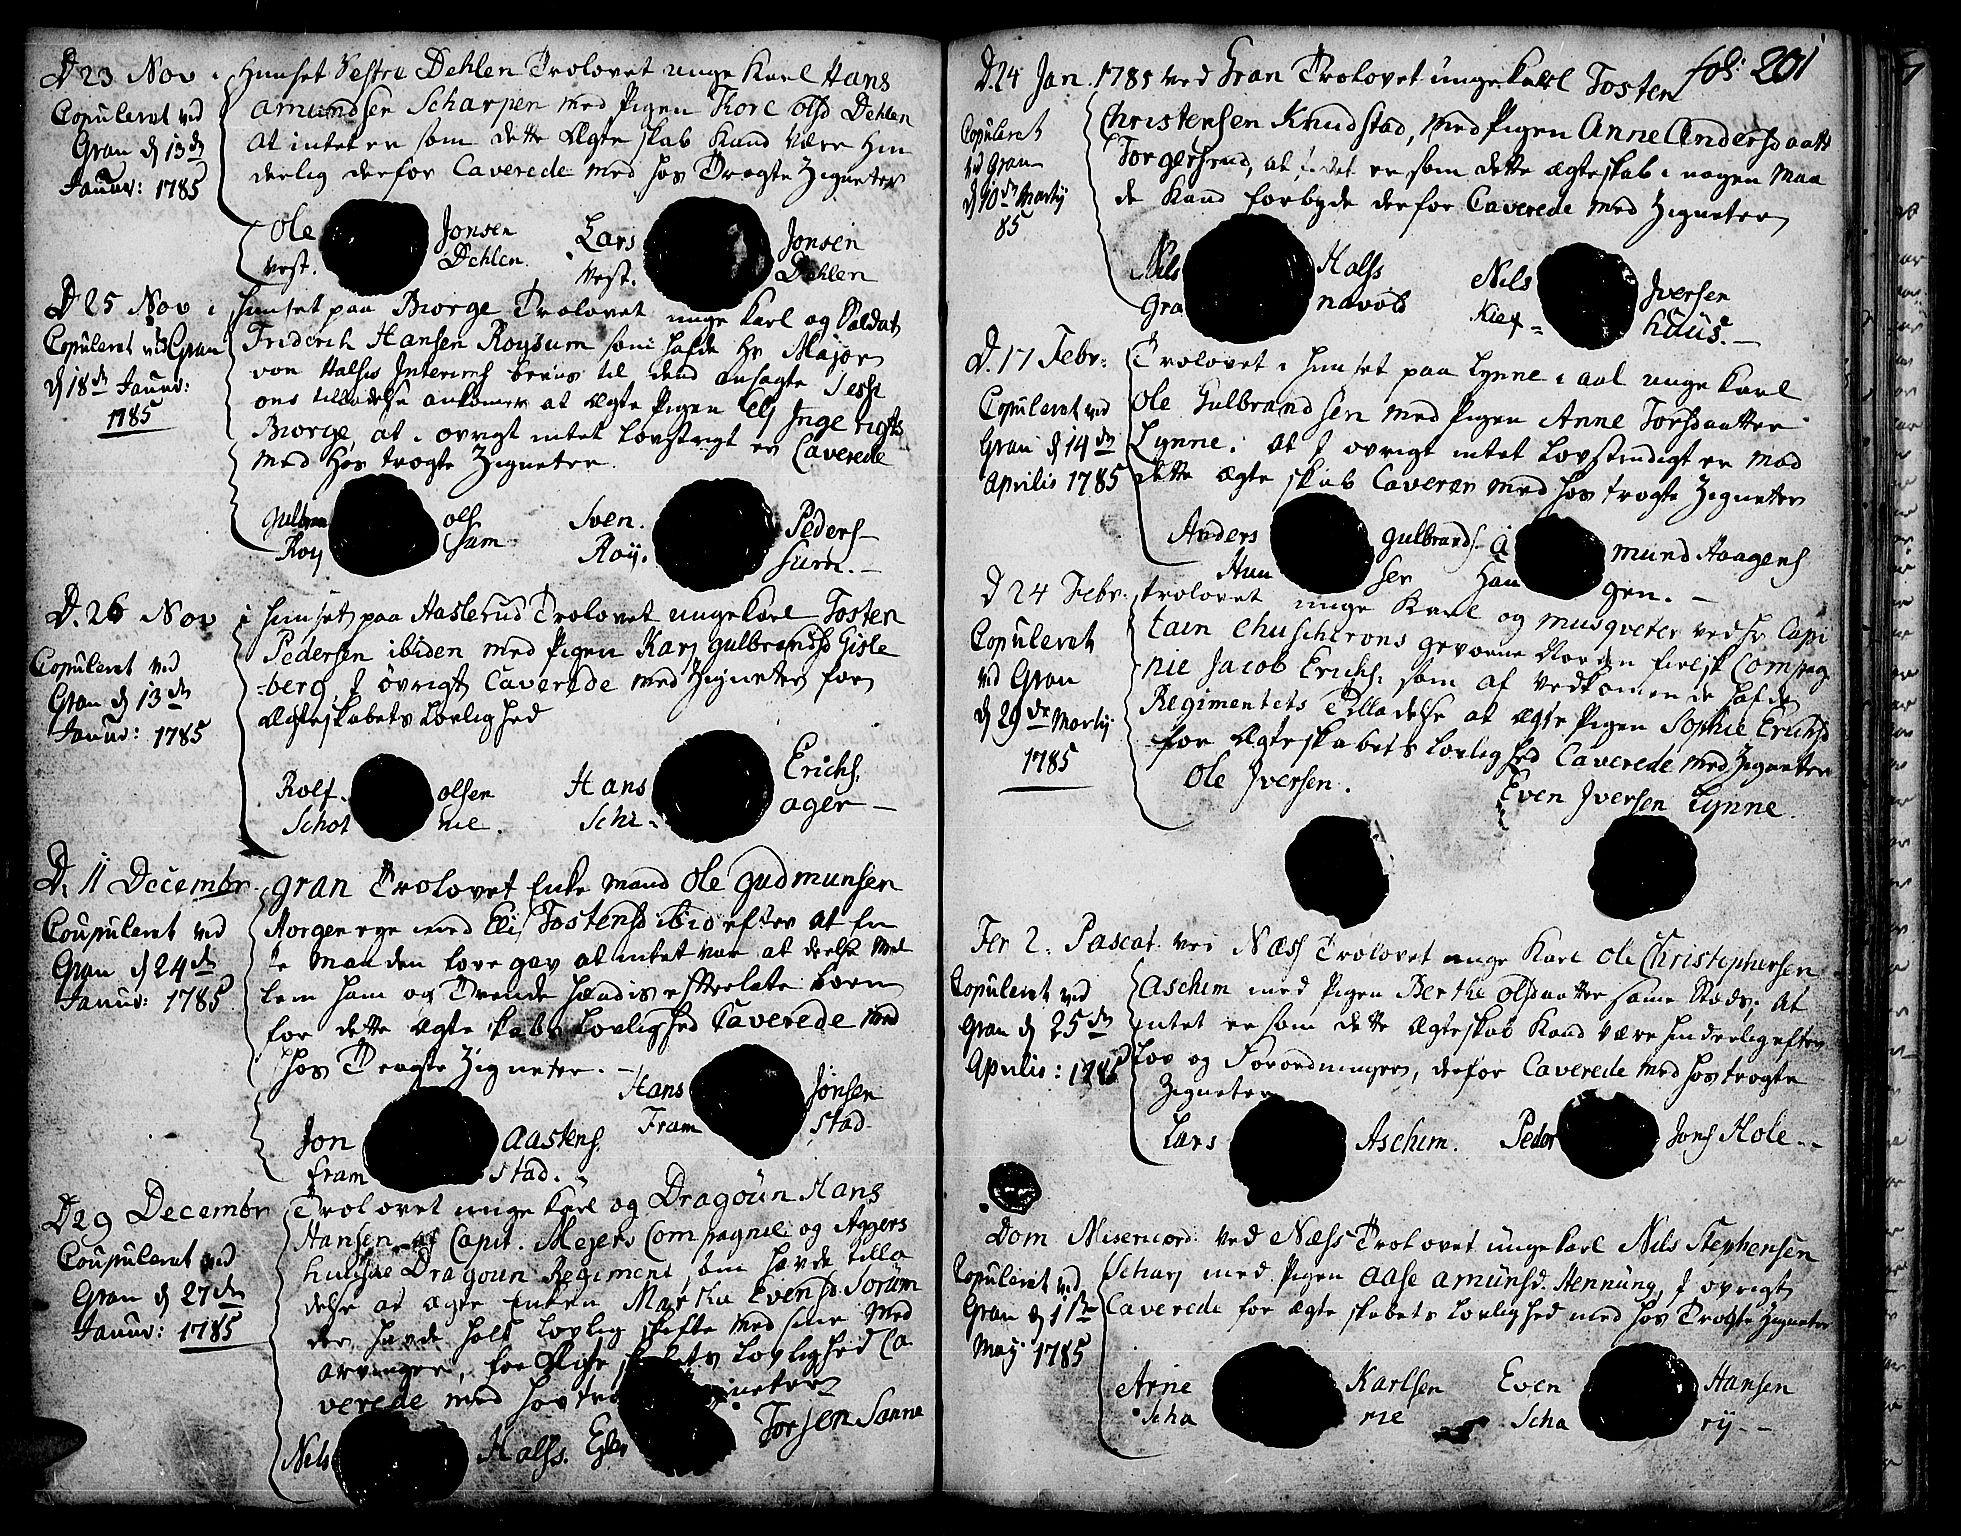 SAH, Gran prestekontor, Ministerialbok nr. 5, 1776-1788, s. 201